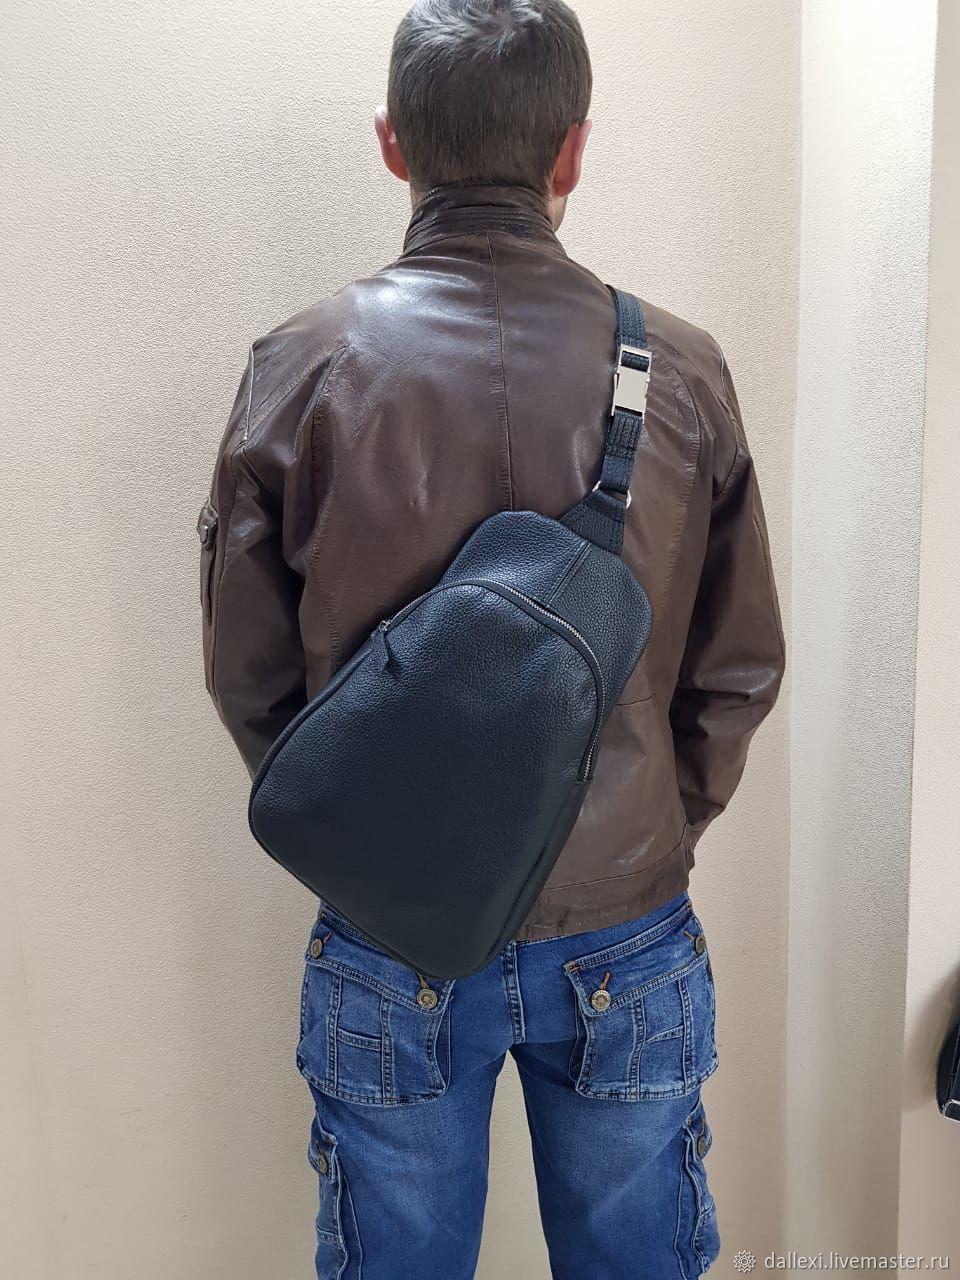 Рюкзак на одно плечо из натуральной кожи, Рюкзаки, Санкт-Петербург,  Фото №1